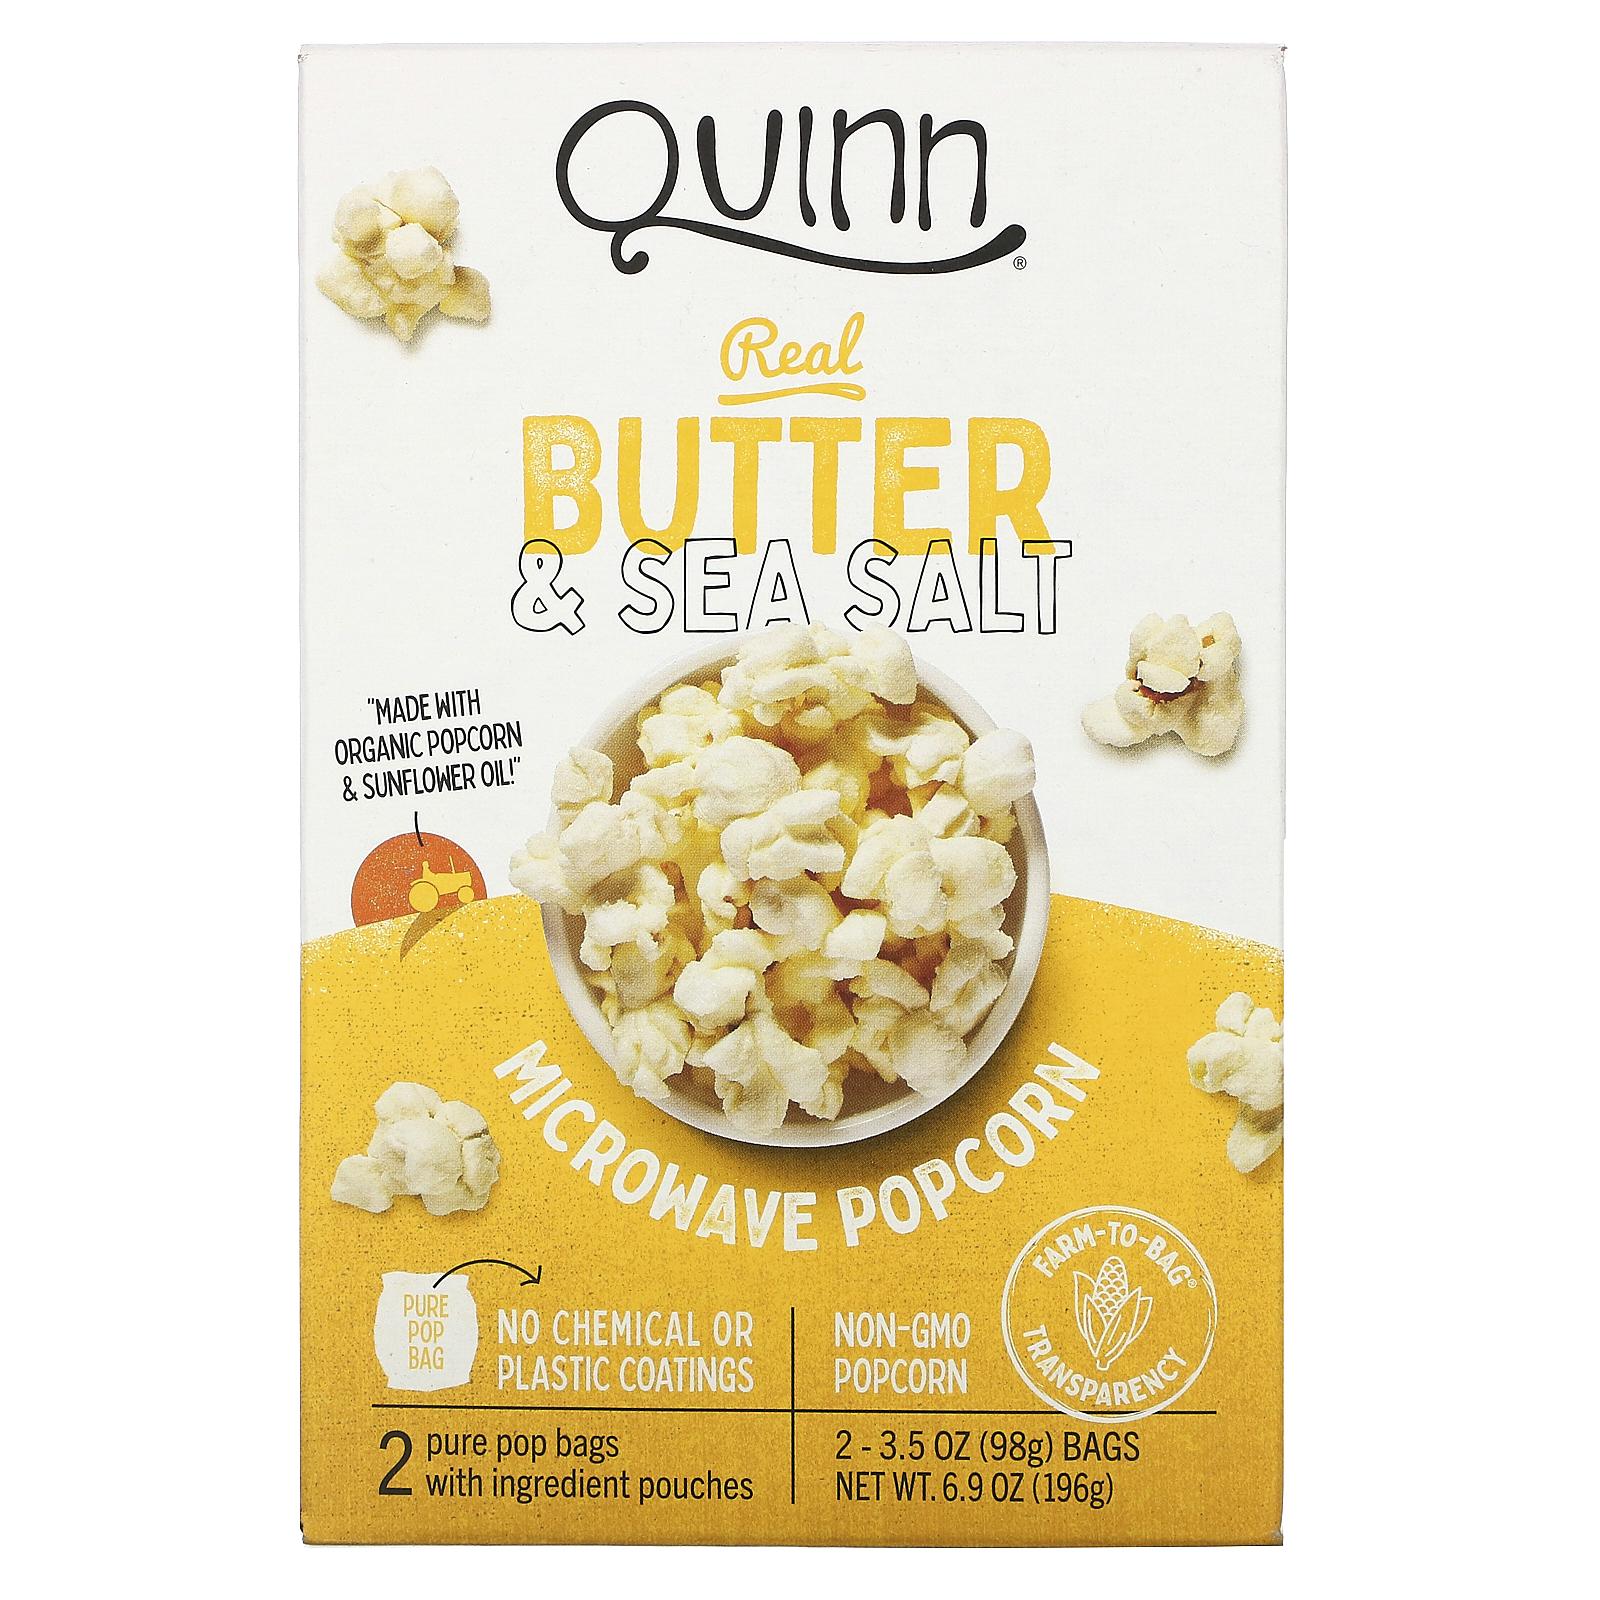 Quinn Popcorn Microwave Real